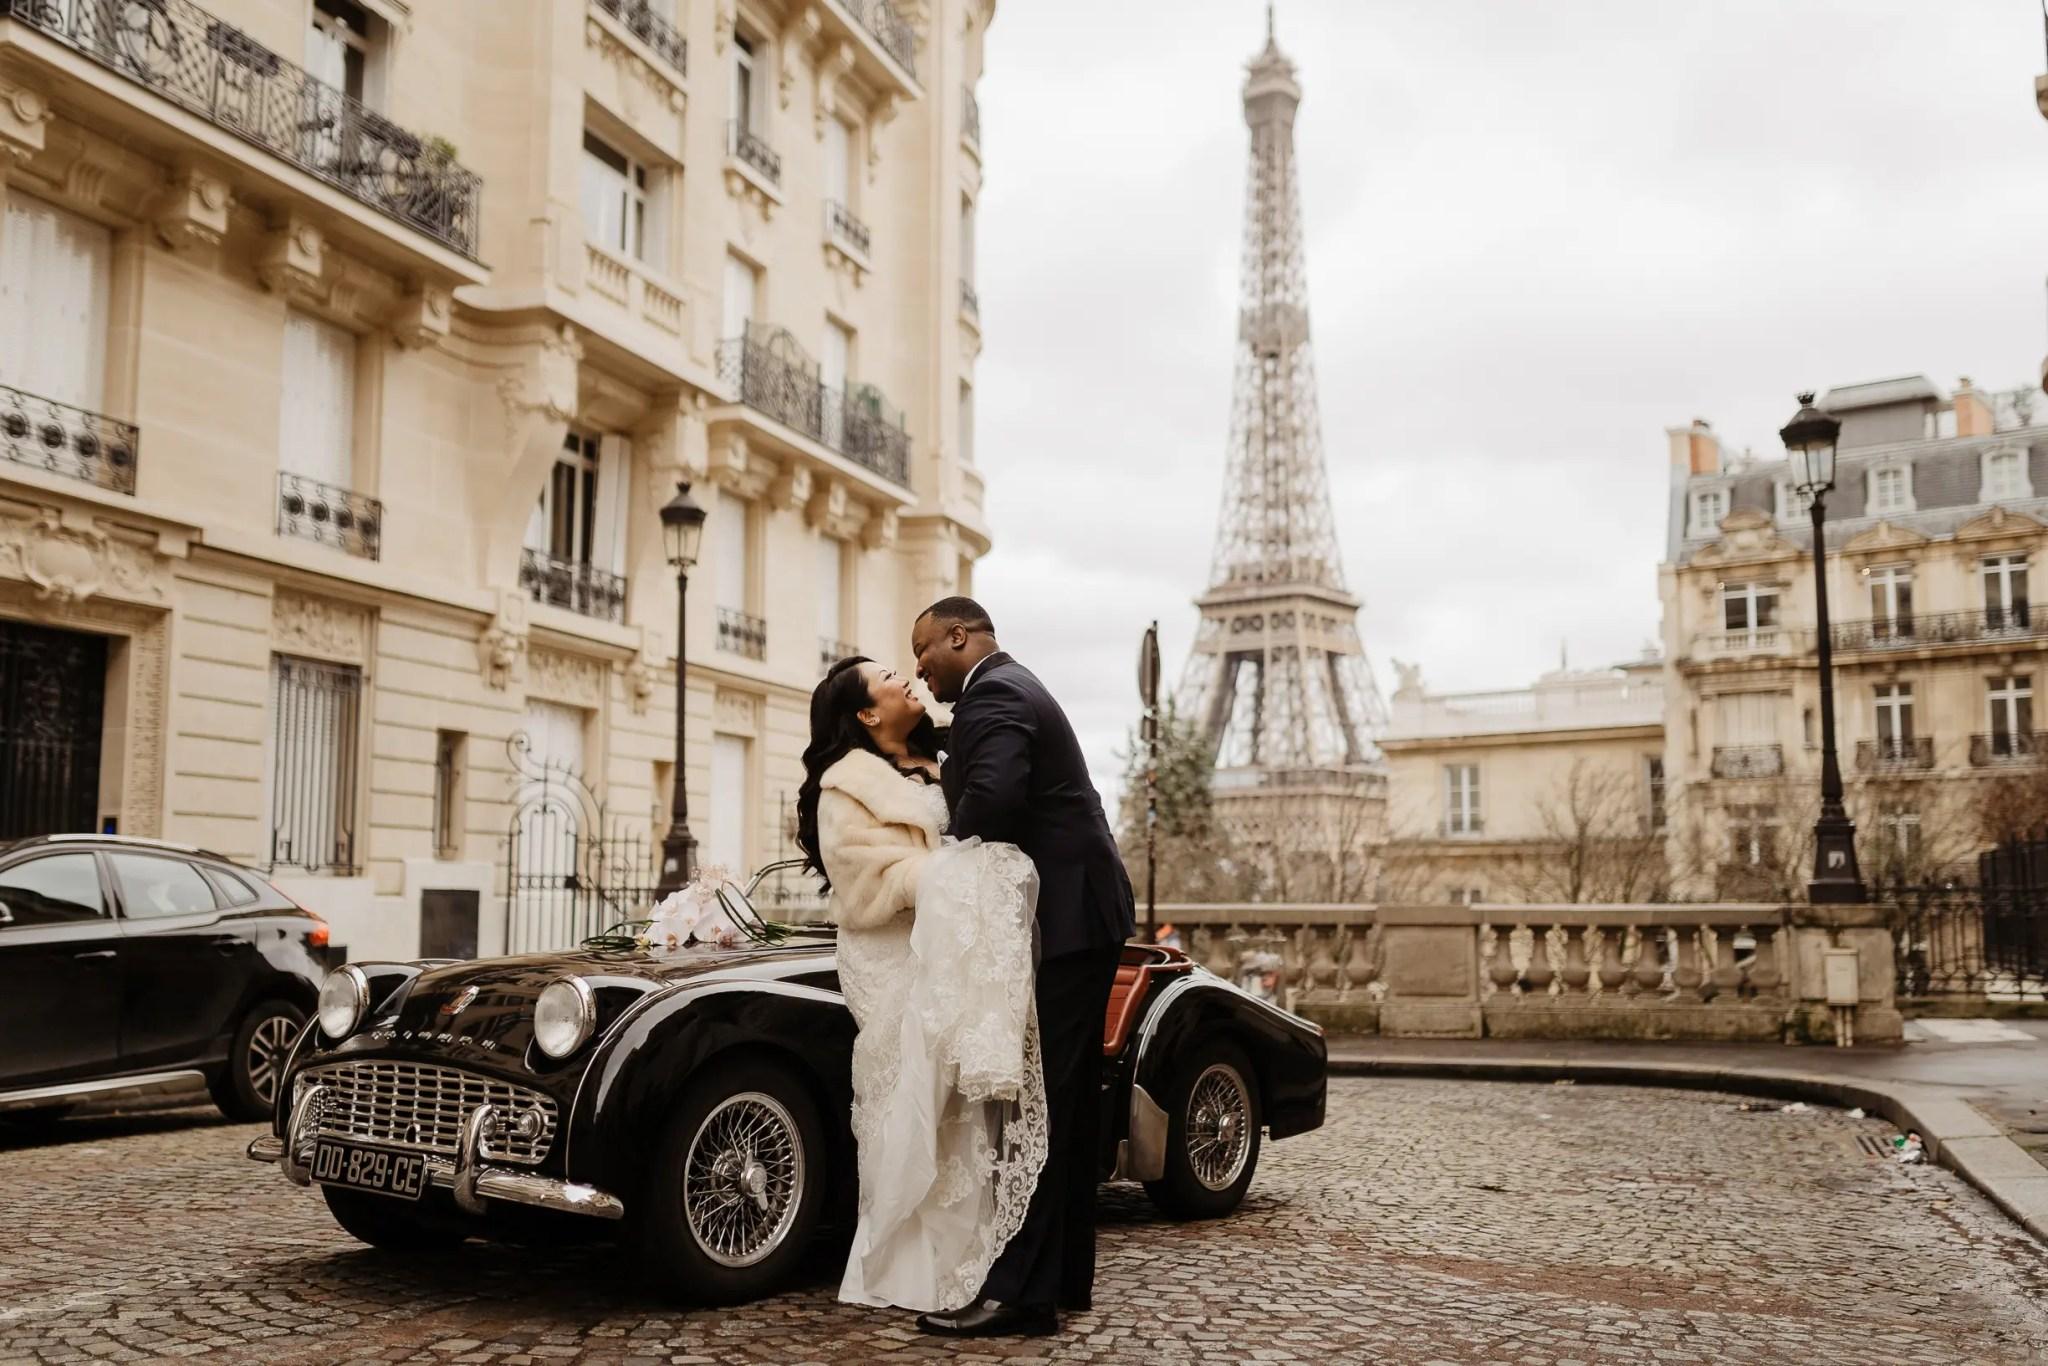 paris wedding photographeer eiffeel tower street vintage car